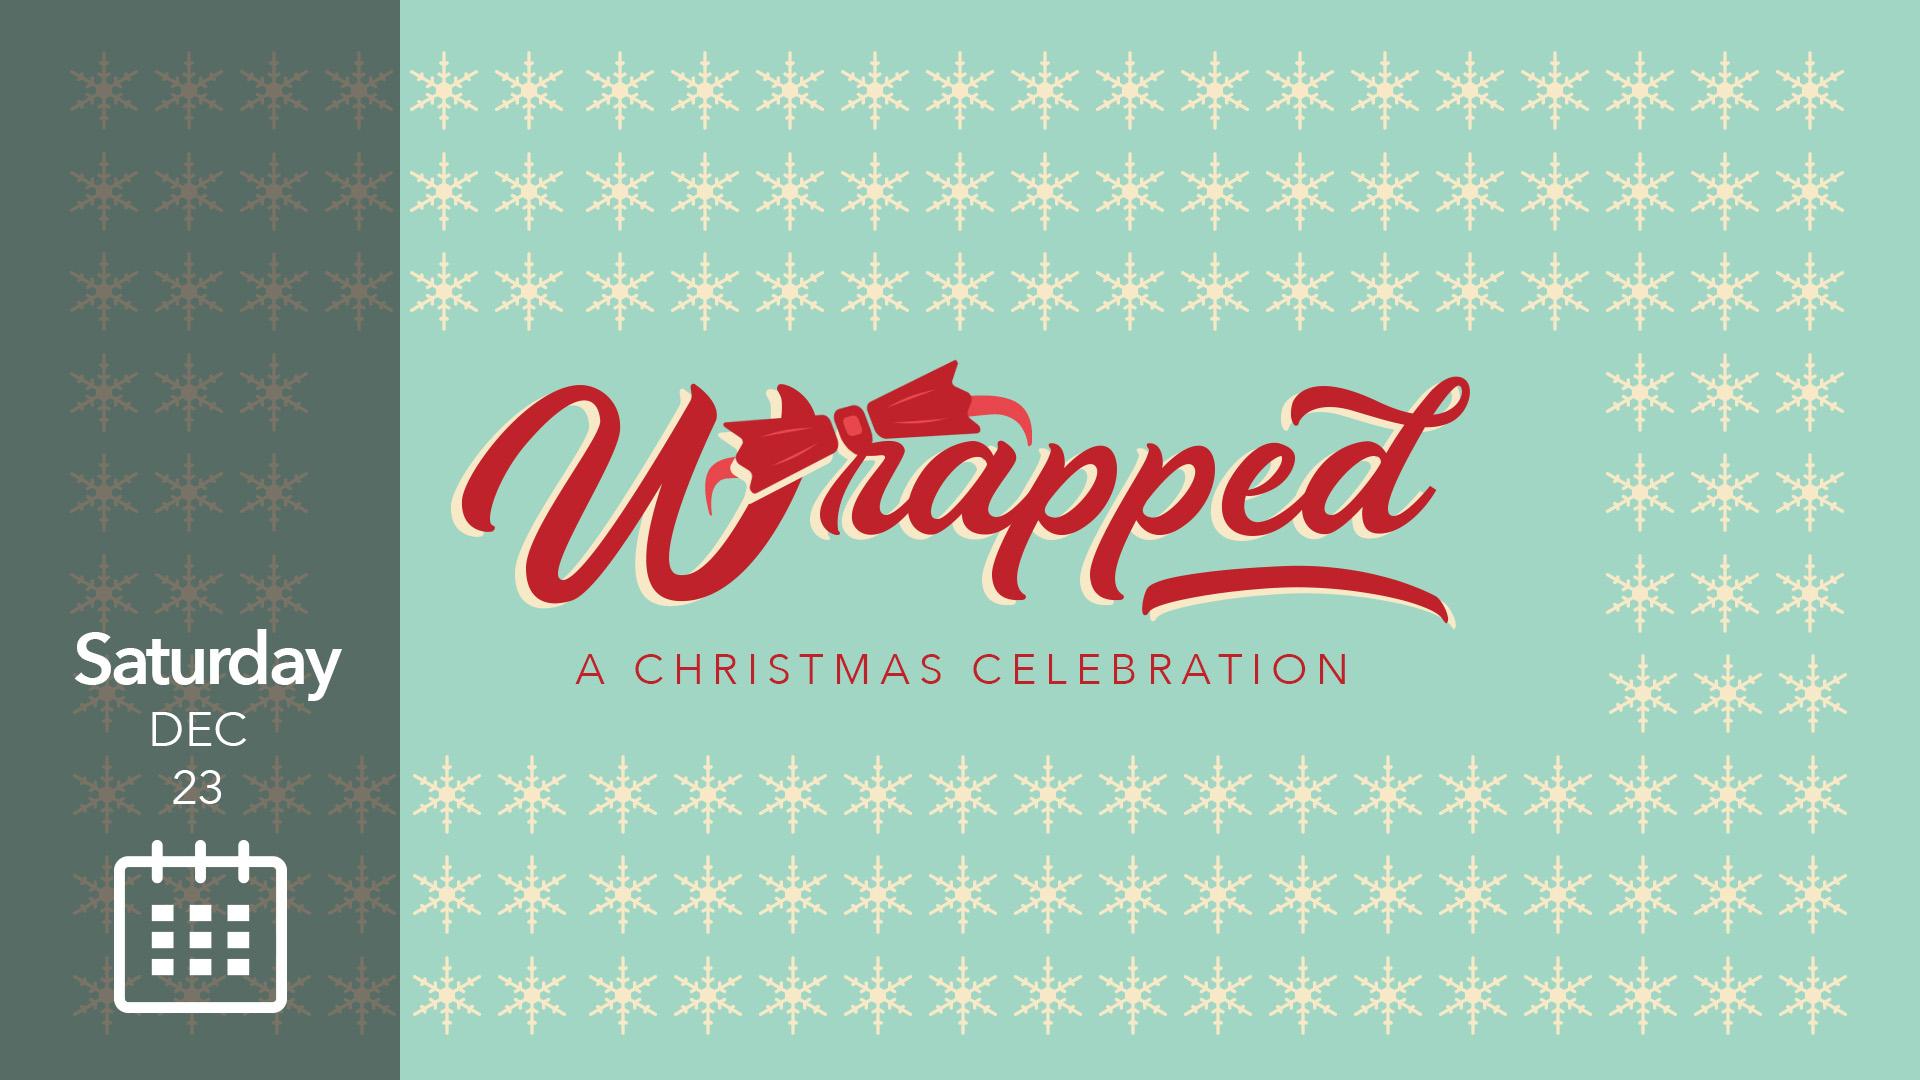 Wrapped-Saturday.jpg